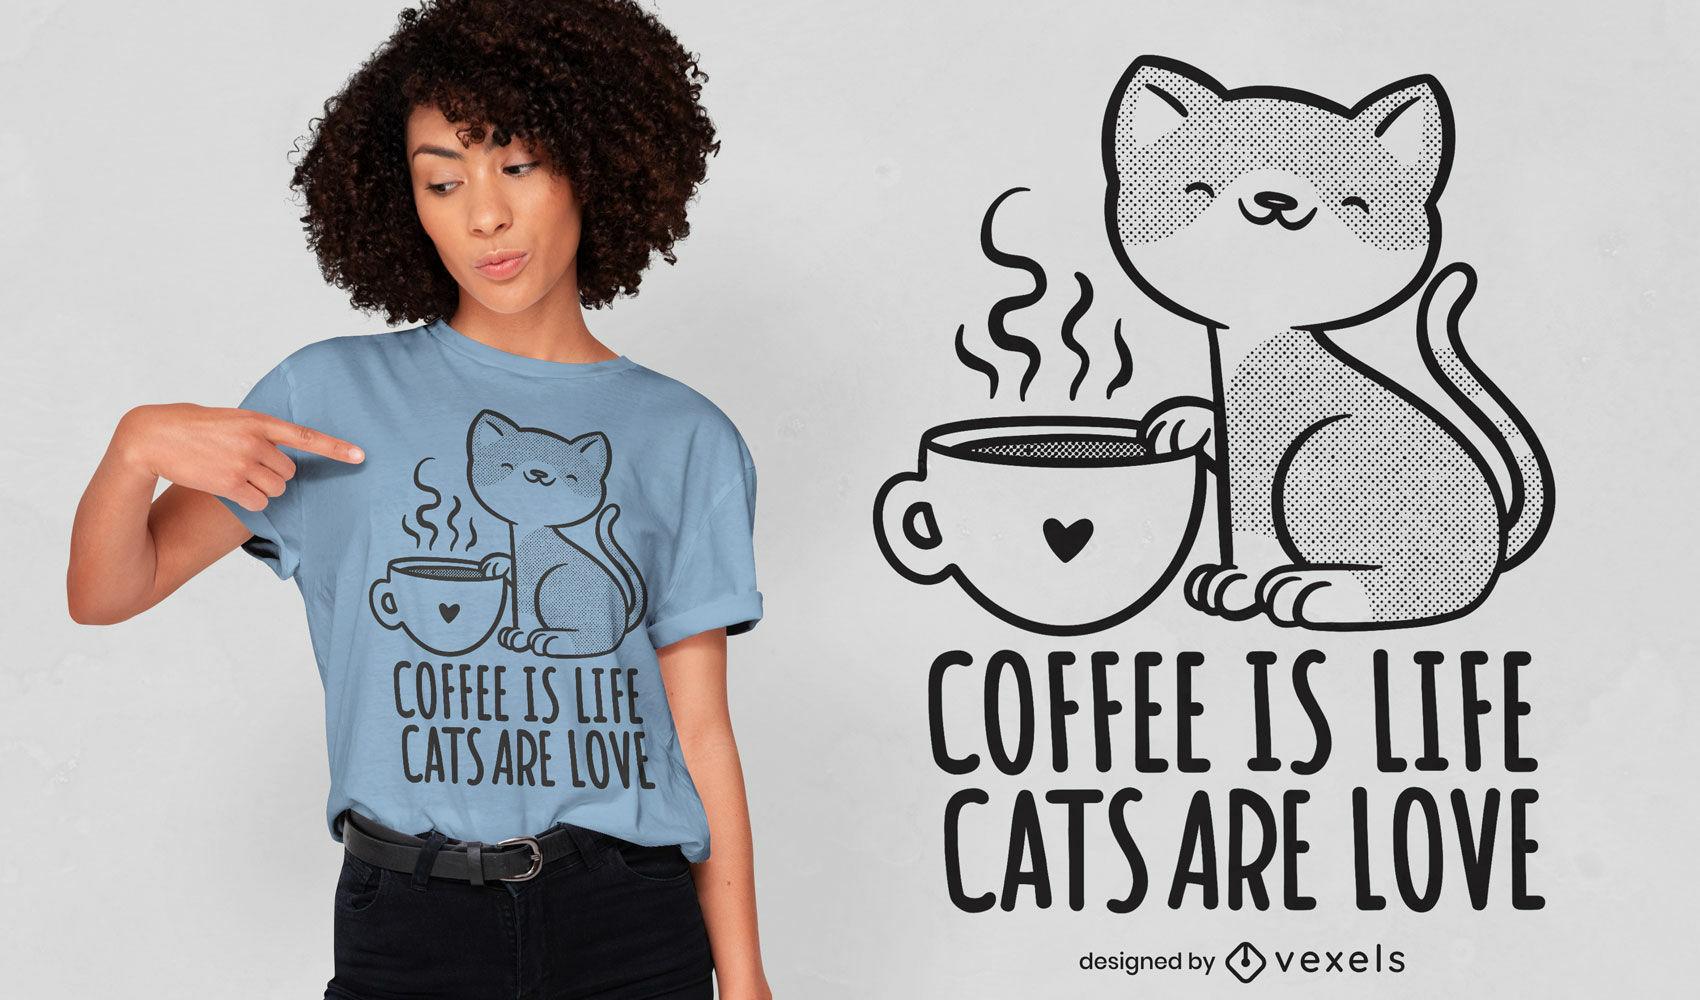 Katze mit Kaffeebecher-T-Shirt-Design